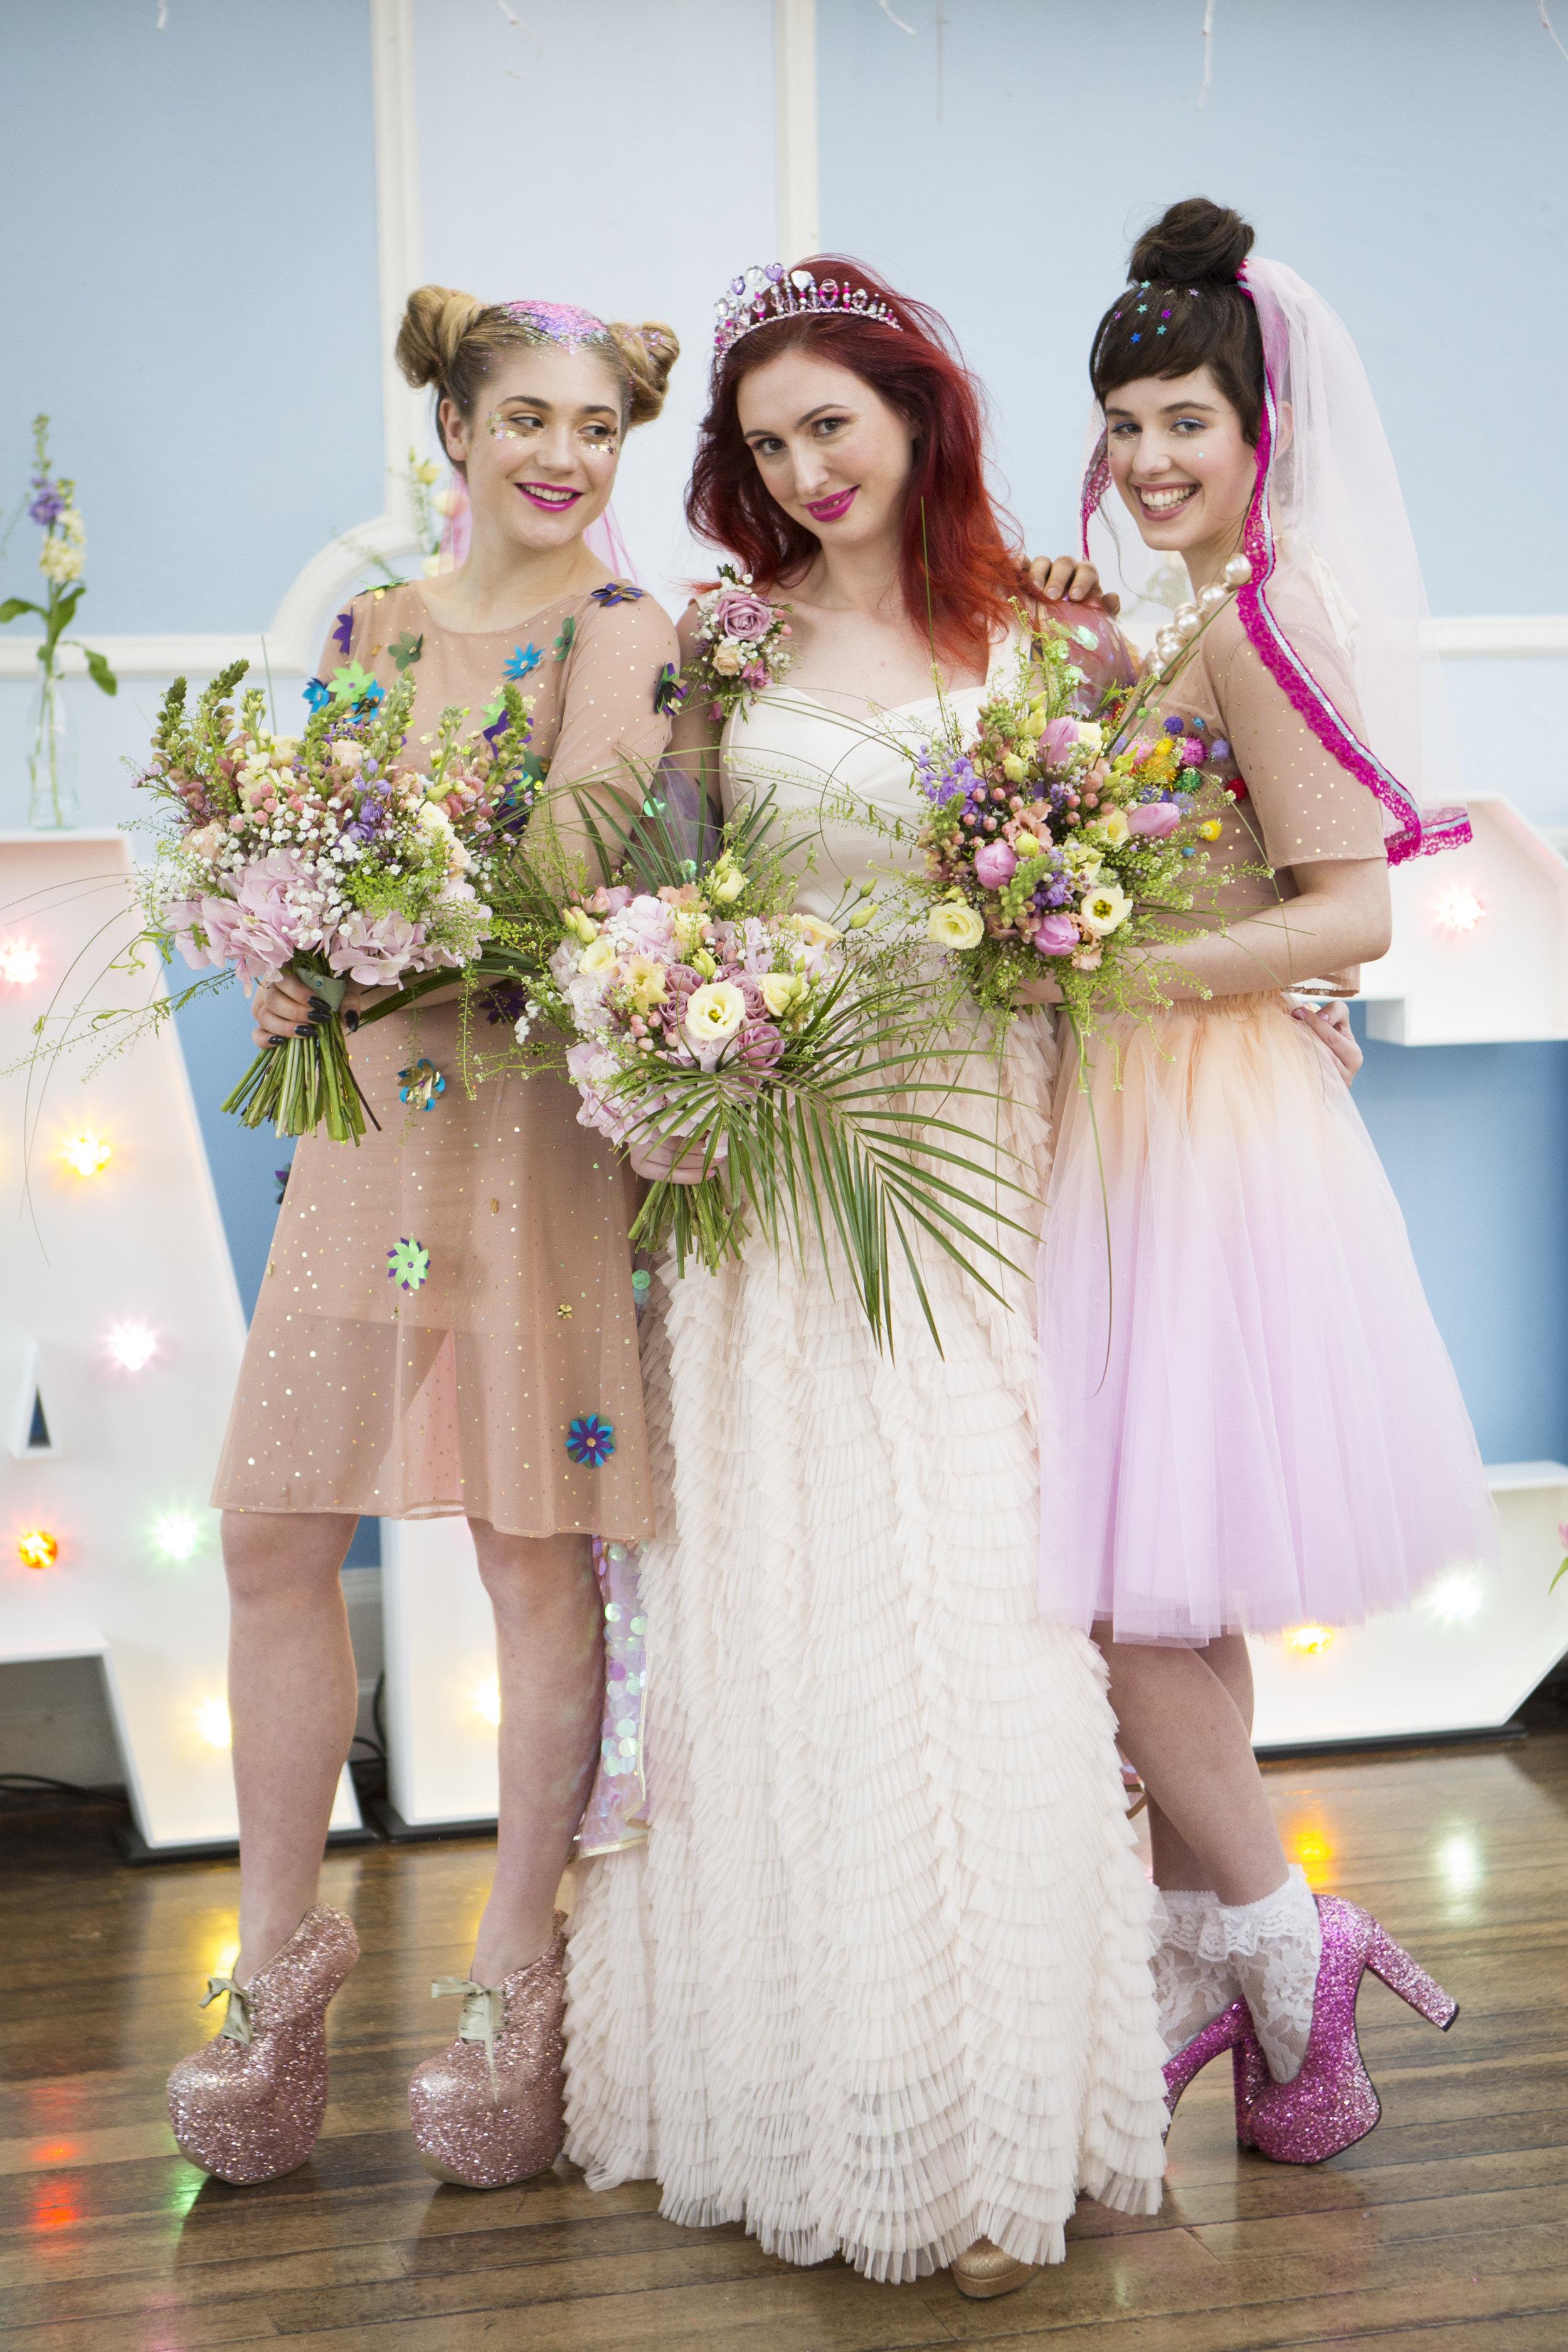 Prom Night Wedding Shoot Meadham Kirchhoff Carrie 00108.jpg